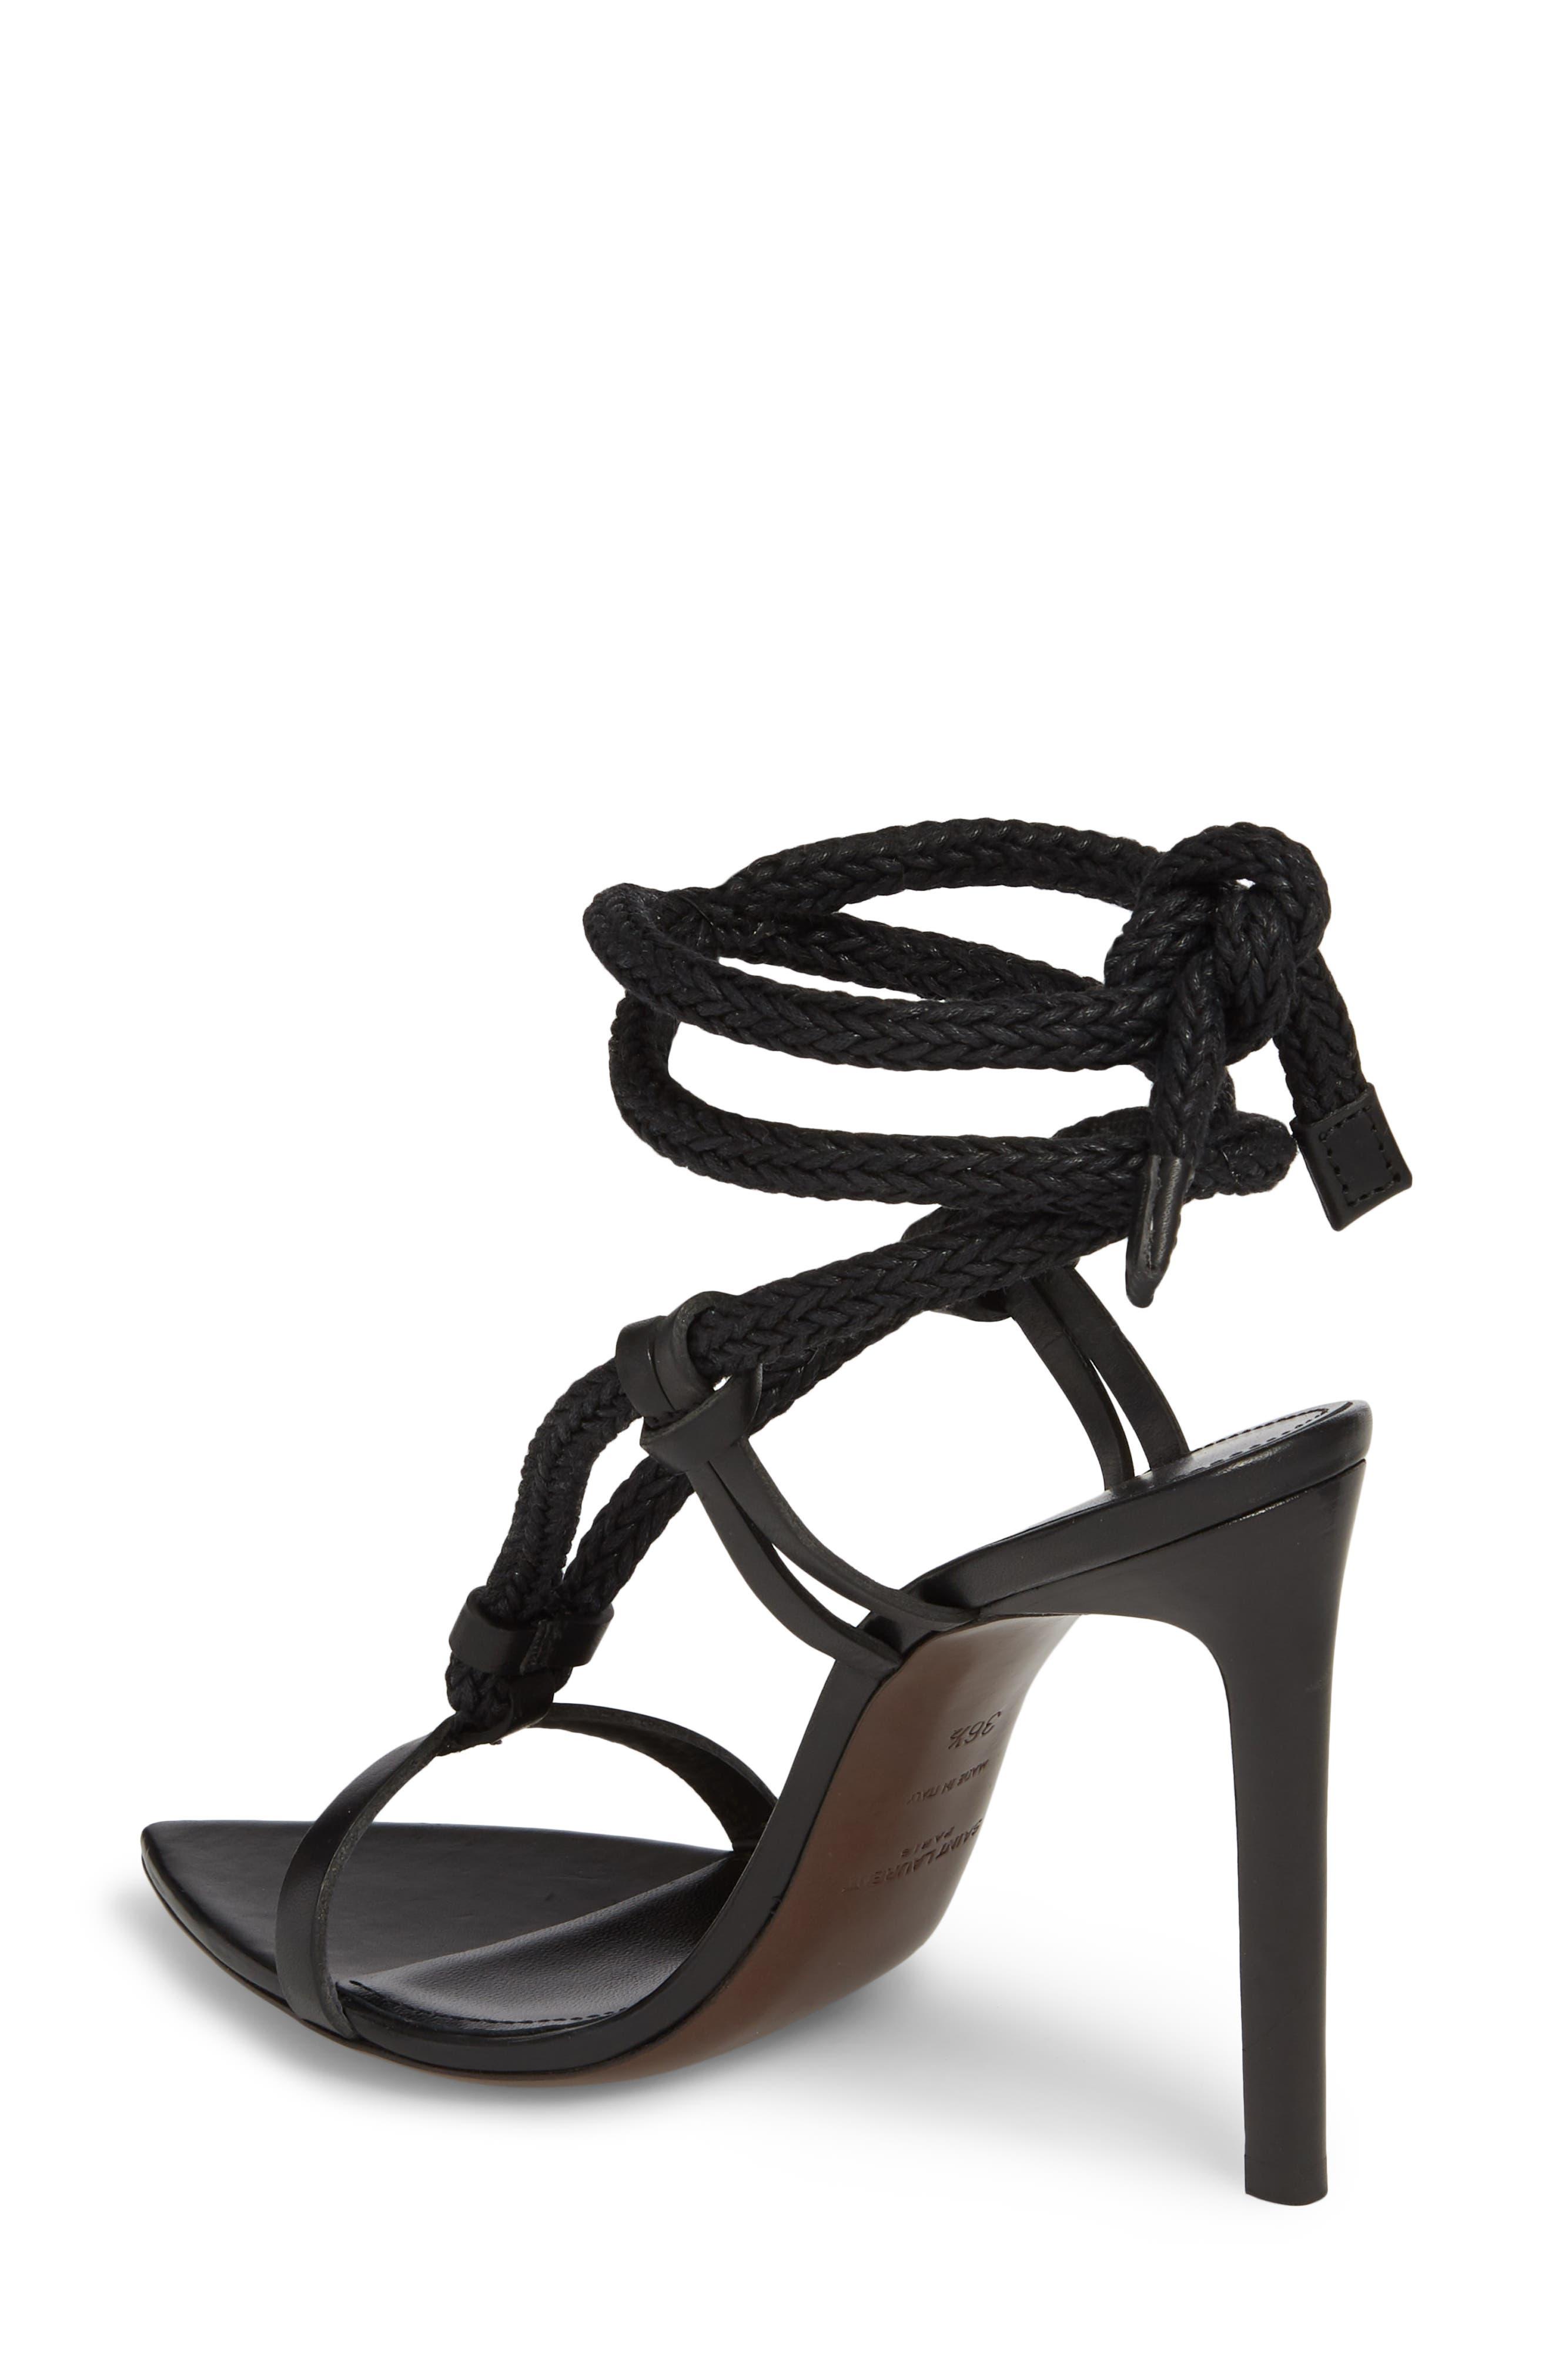 Majorelle Ankle Tie Sandal,                             Alternate thumbnail 2, color,                             001